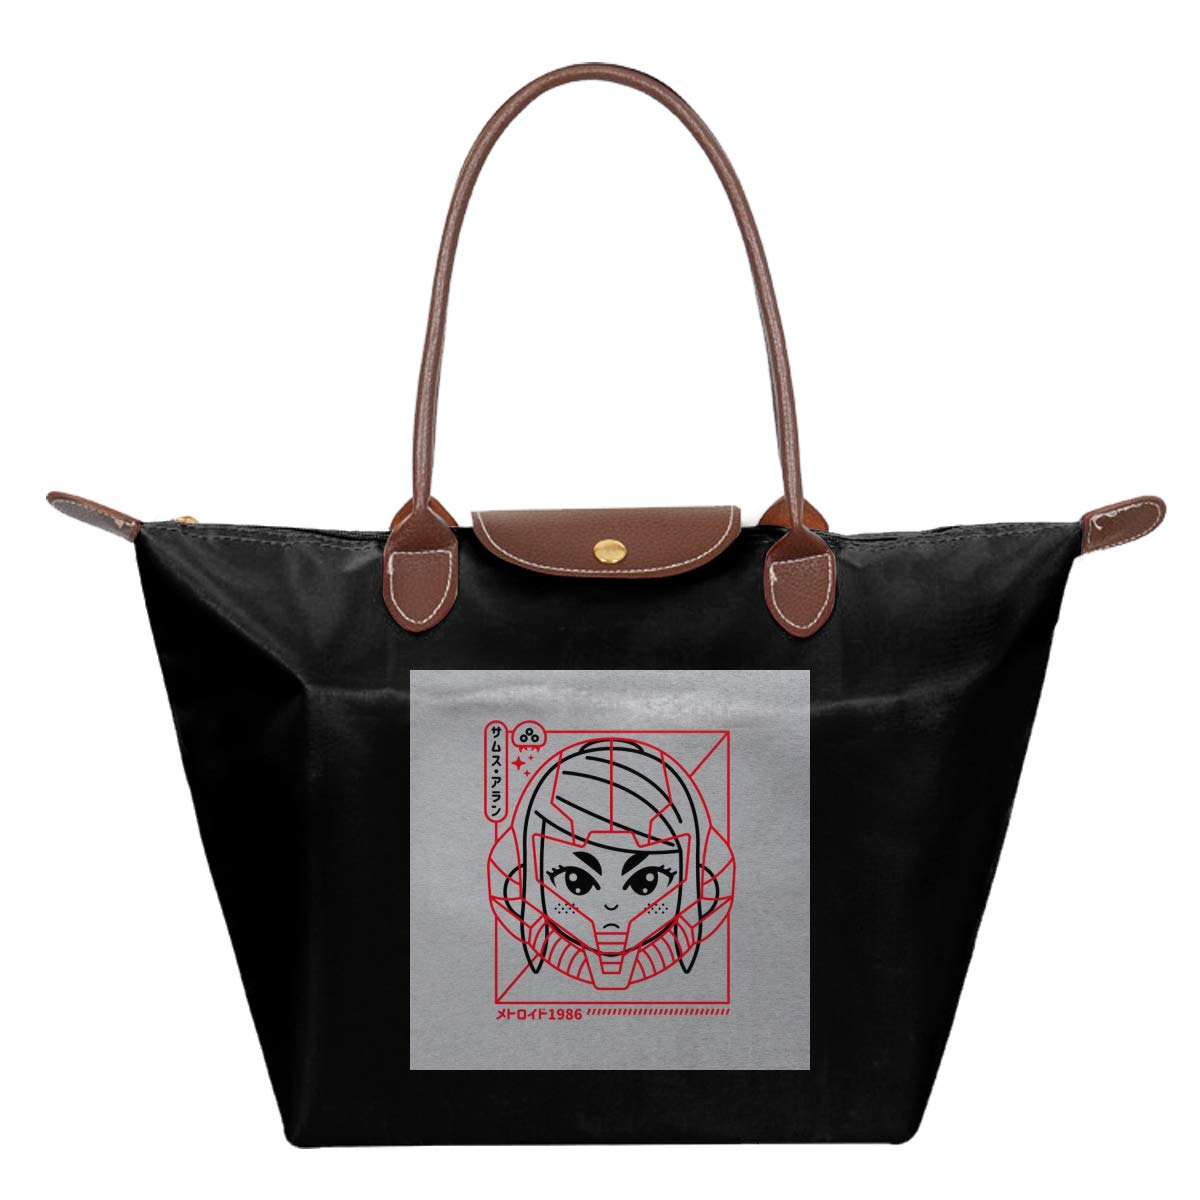 Cyber Helmet Metoroid Waterproof Leather Folded Messenger Nylon Bag Travel Tote Hopping Folding School Handbags